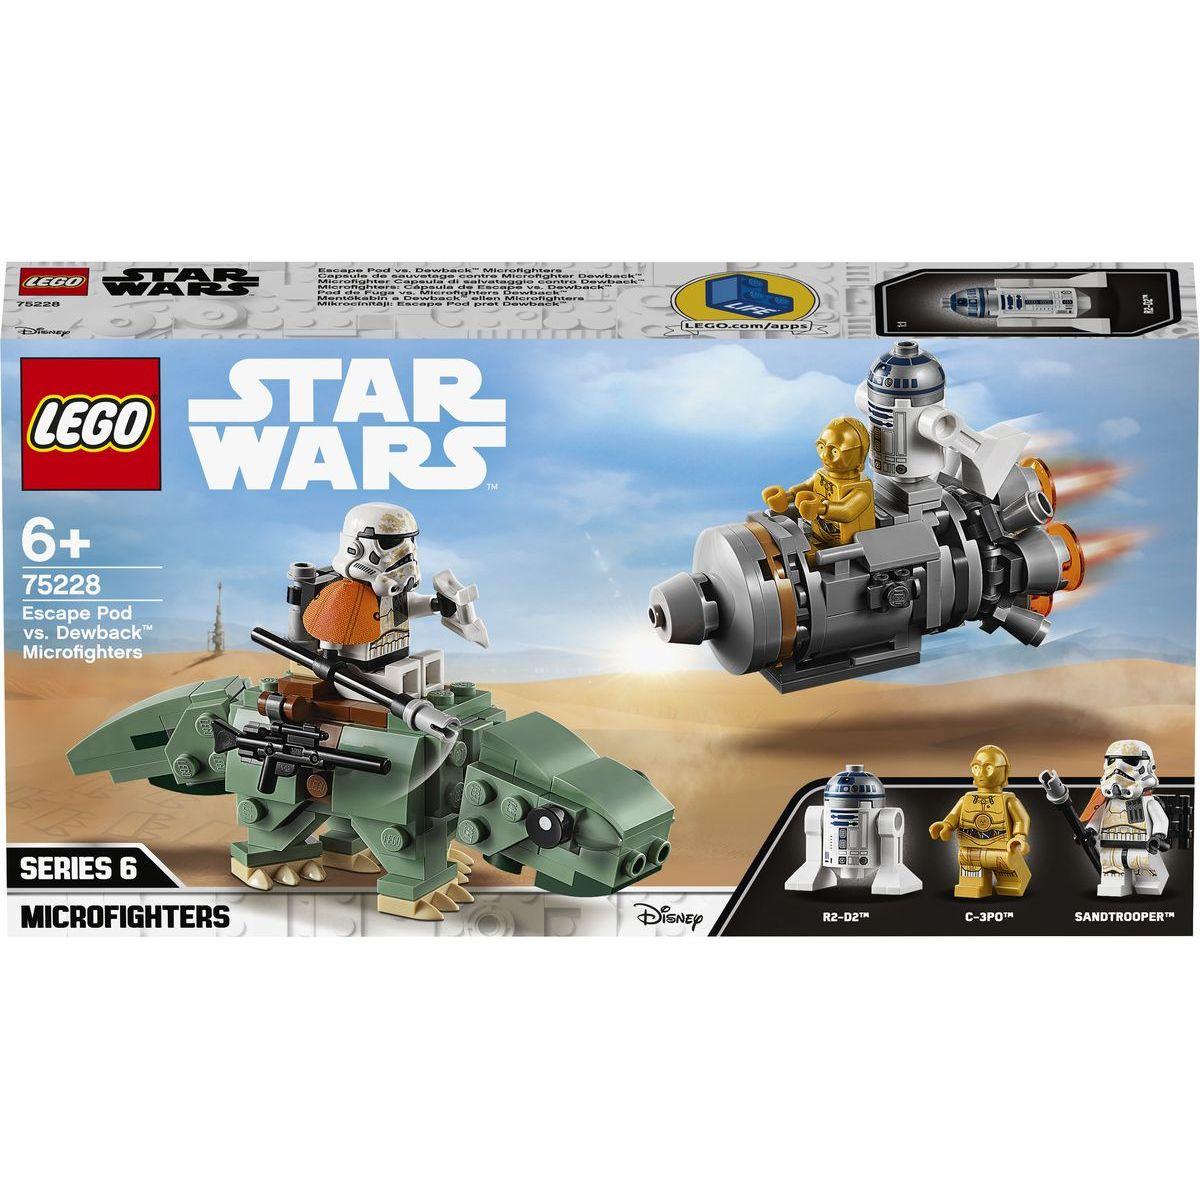 LEGO Star Wars 75228 Únikový modul vs. Dewback™